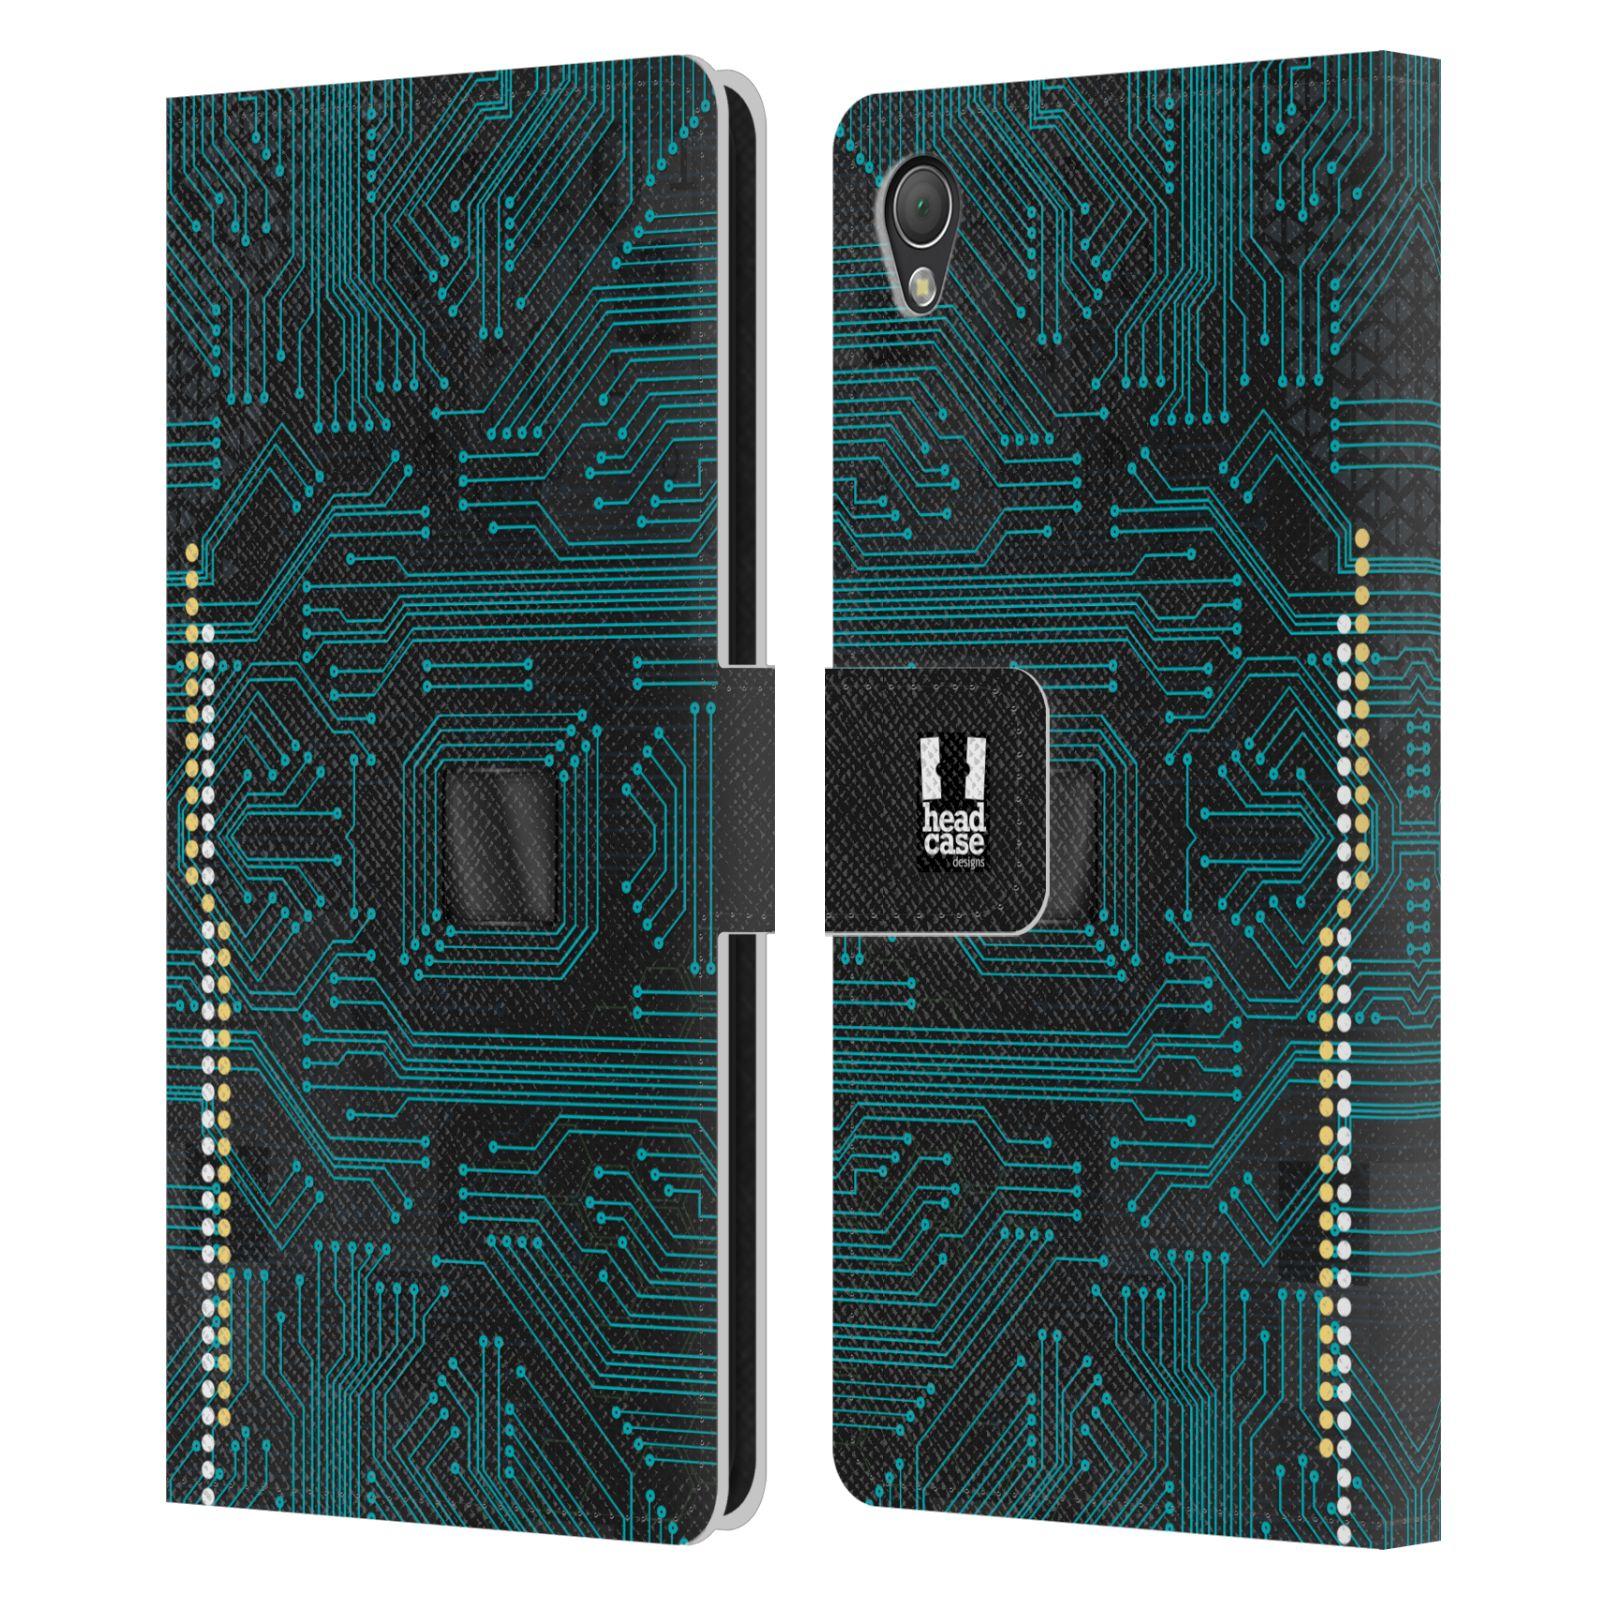 HEAD CASE Flipové pouzdro pro mobil SONY XPERIA Z3 počítač základní deska modrá barva